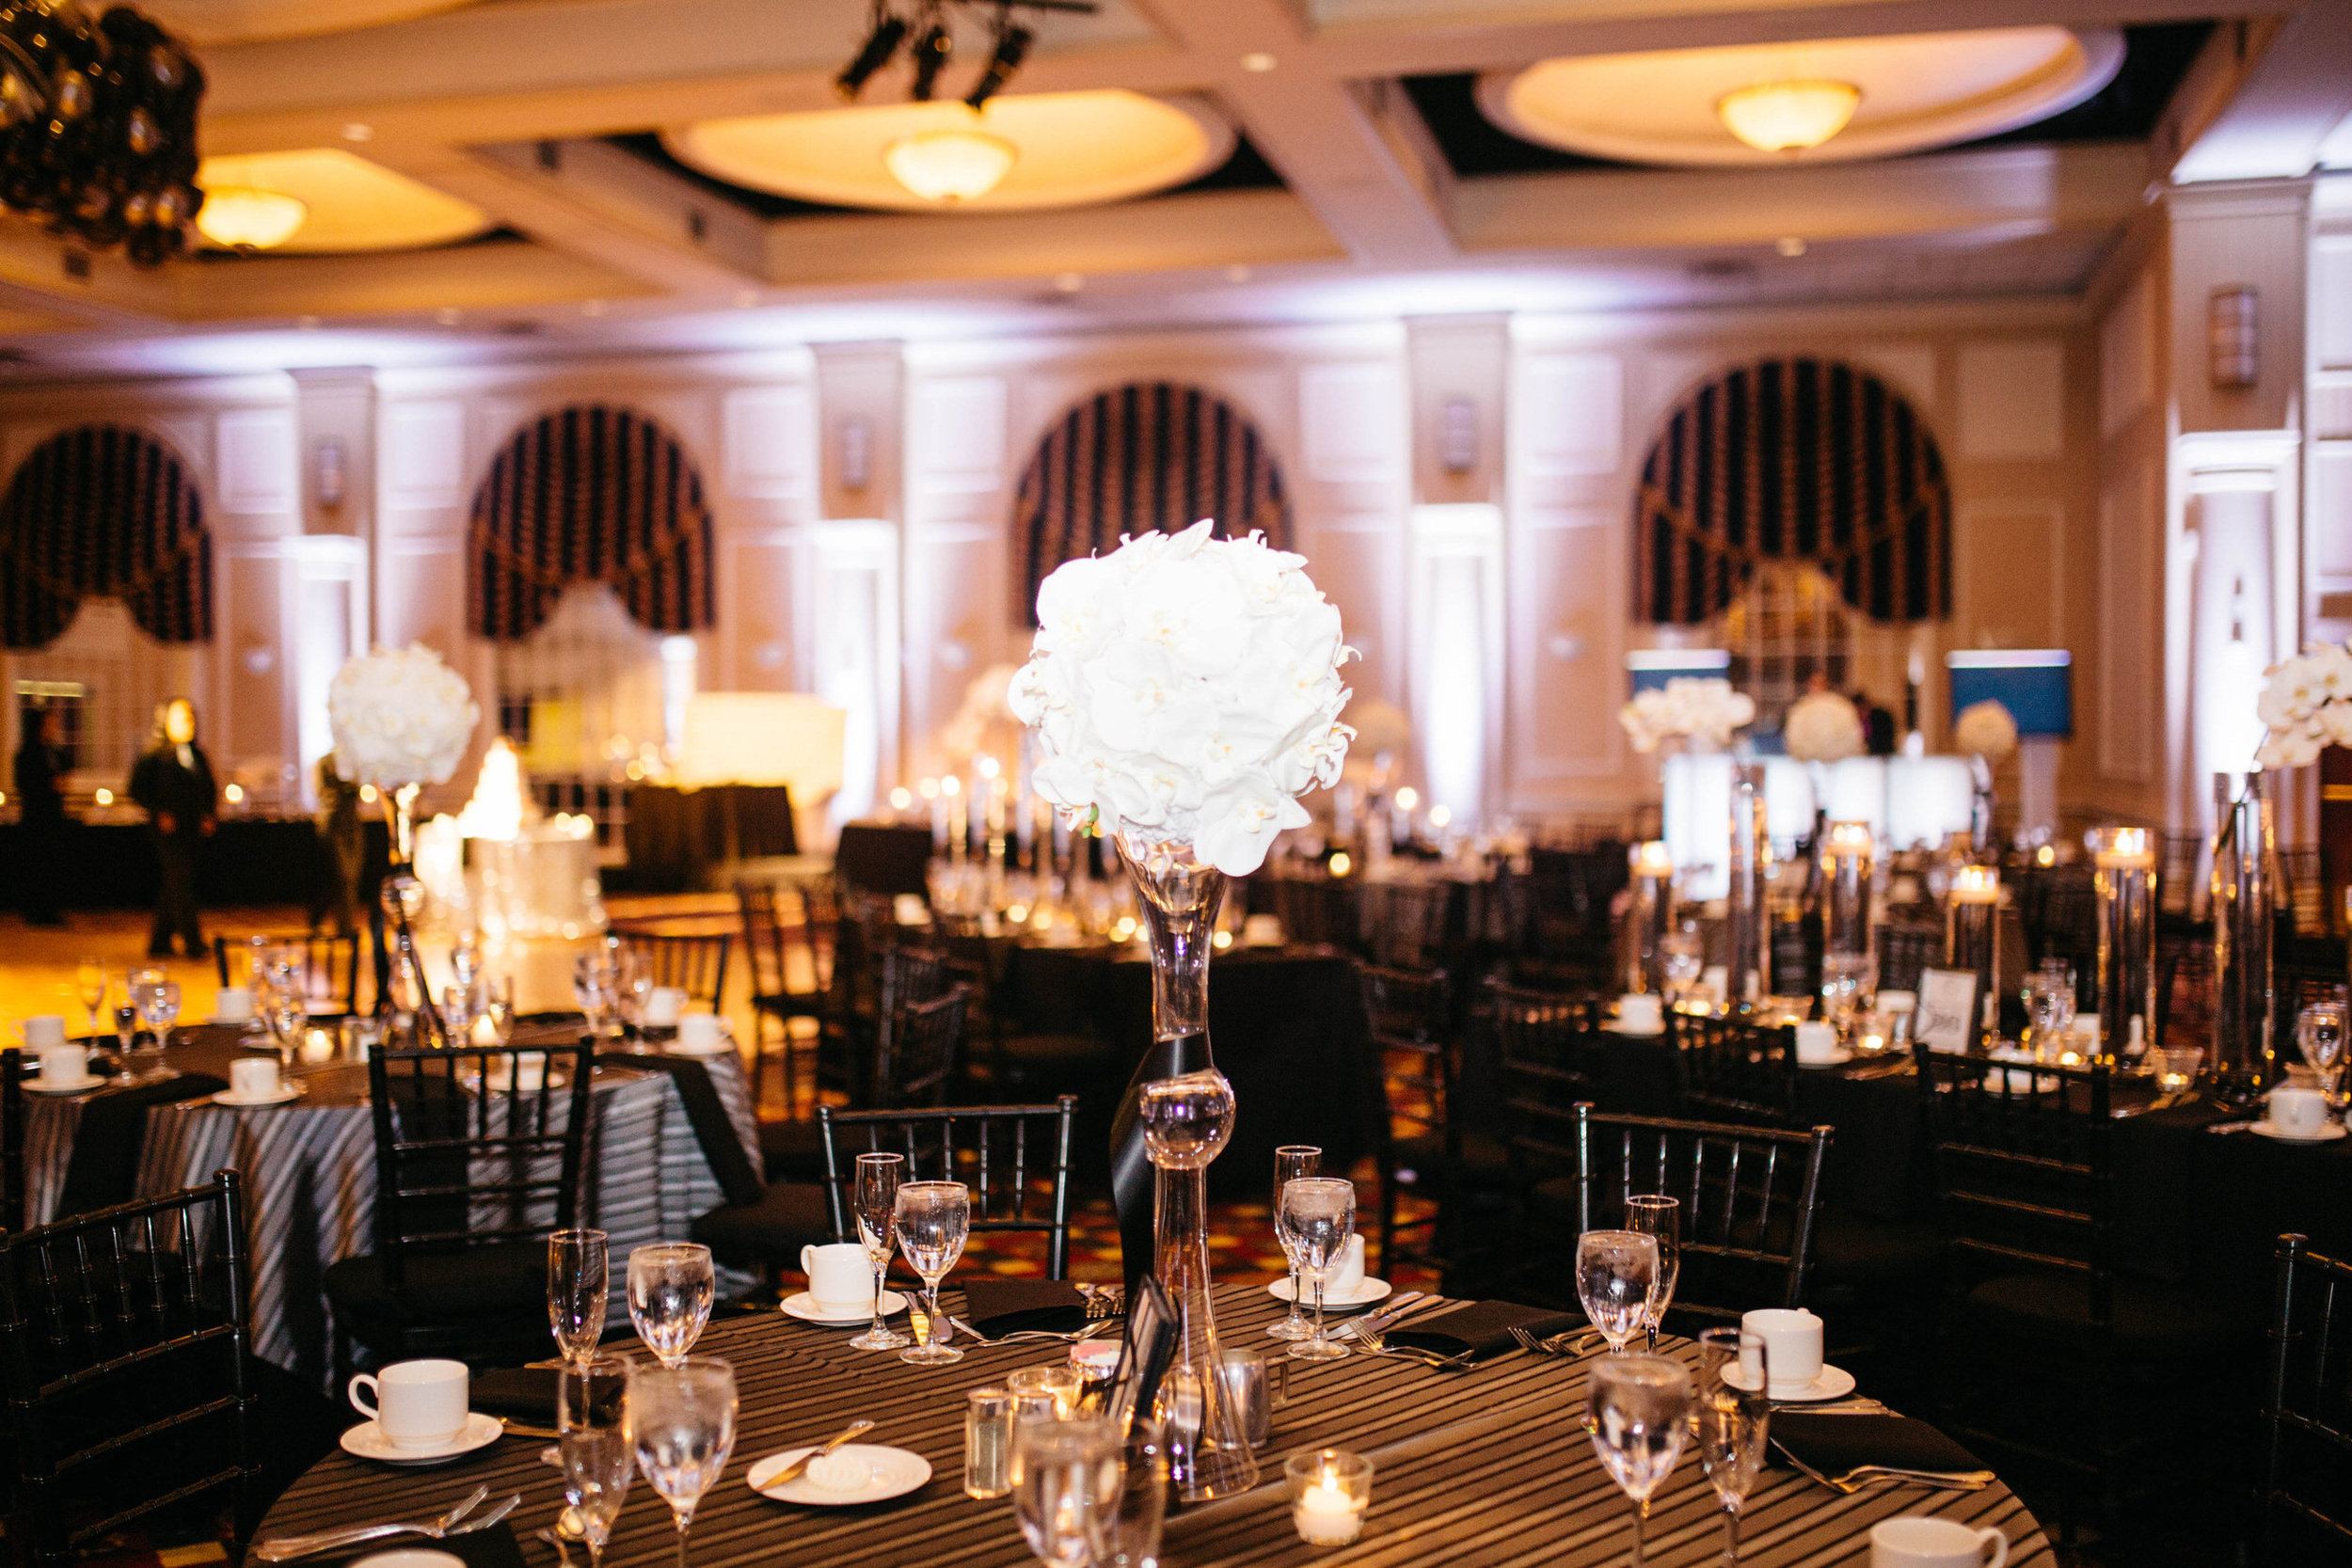 25 White Orchid Sphere Black and White Wedding Trumpet Vase.jpg